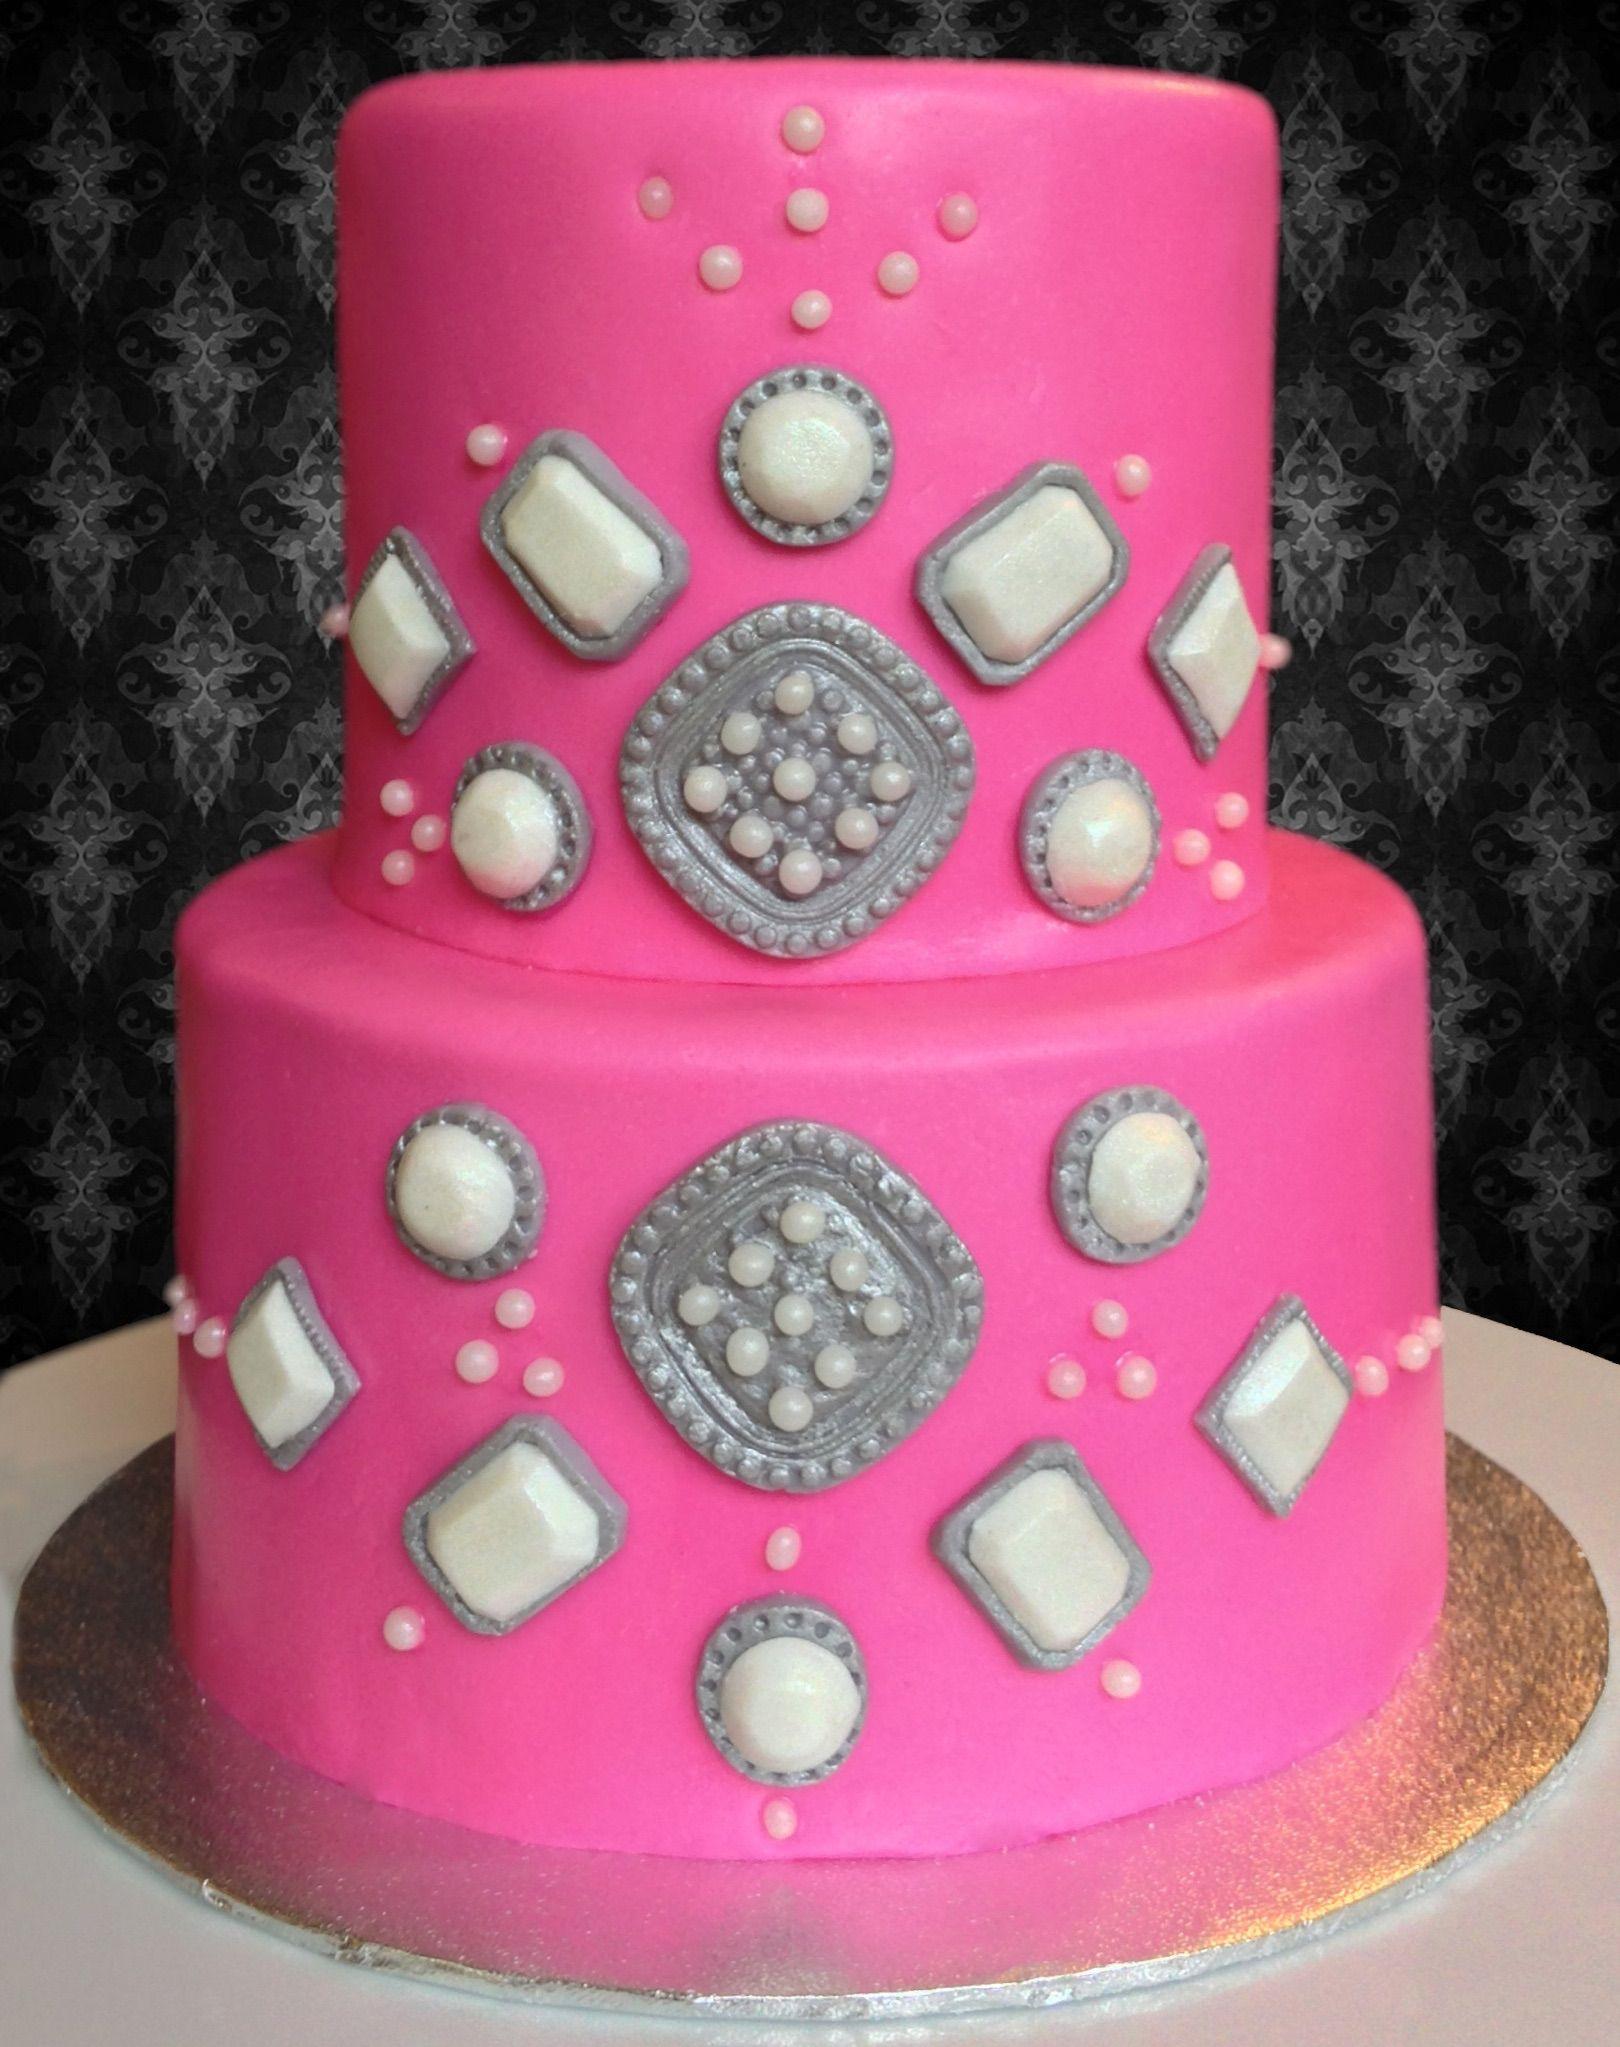 Pink Jeweled Birthday Cake | Cake, Jewel cake, Chocolate ...